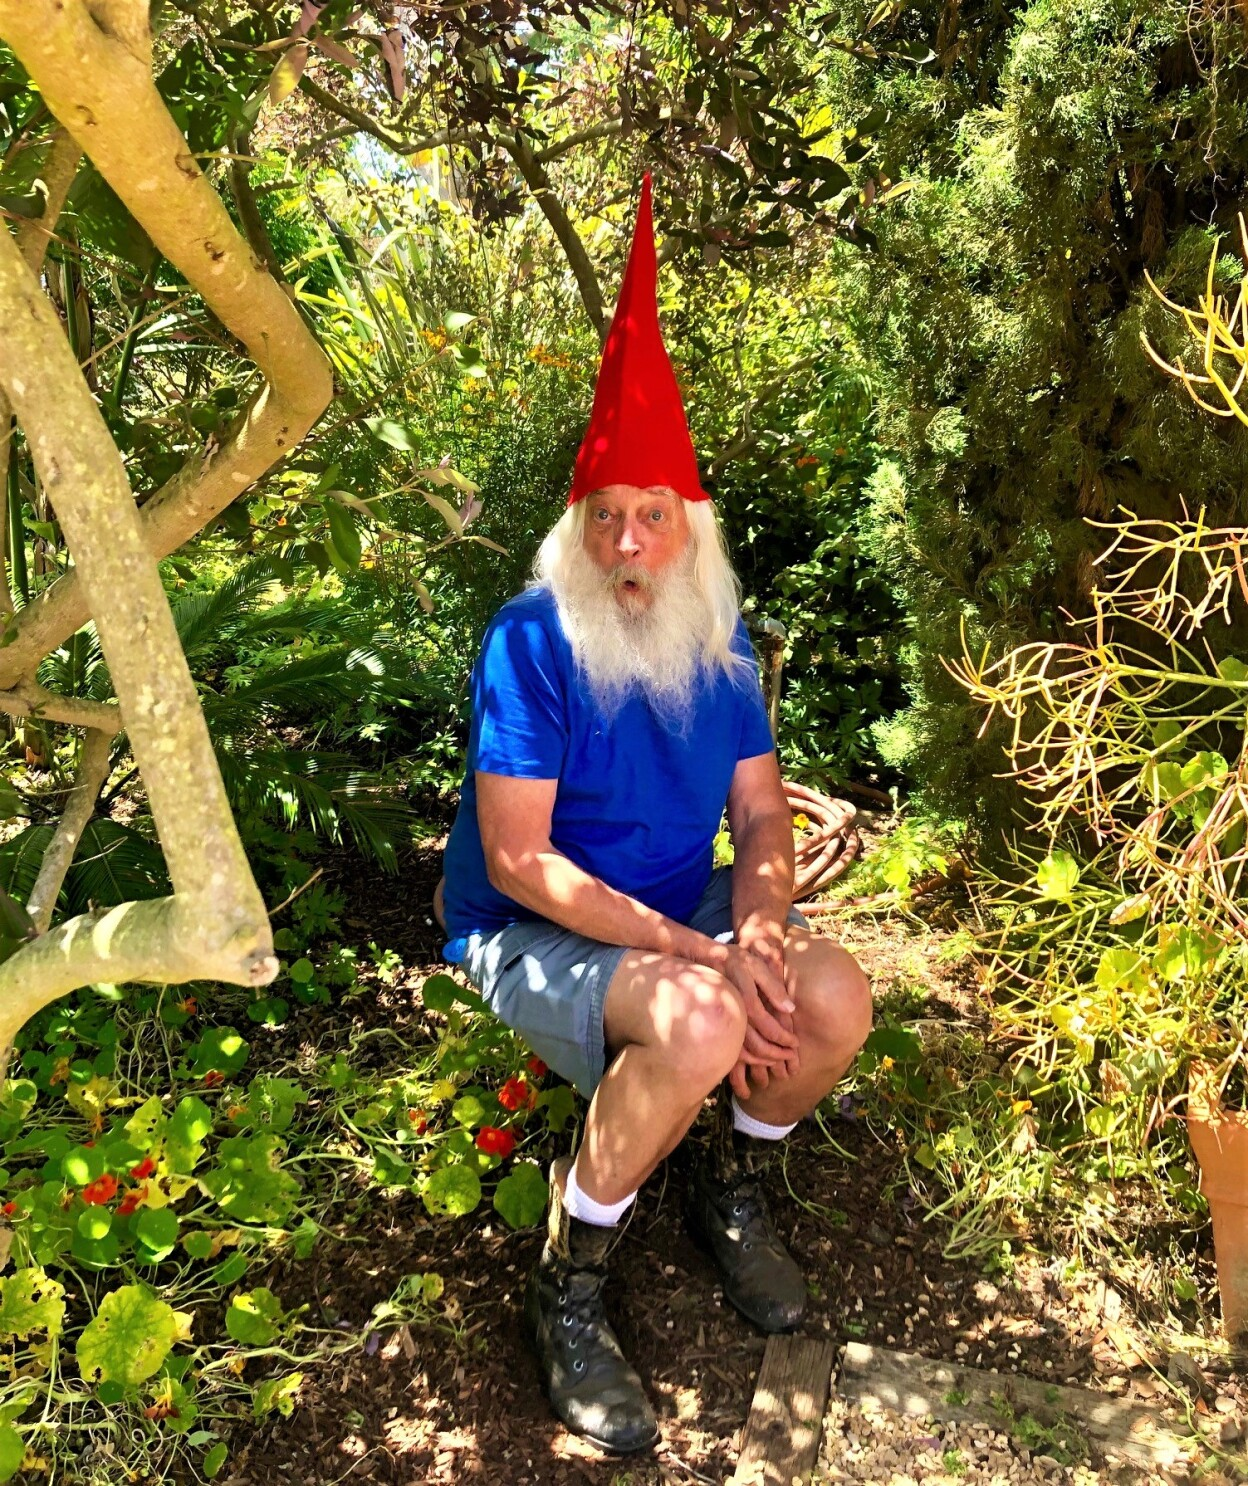 La Jolla Historical Society's Bill Carey leads a secret life as a